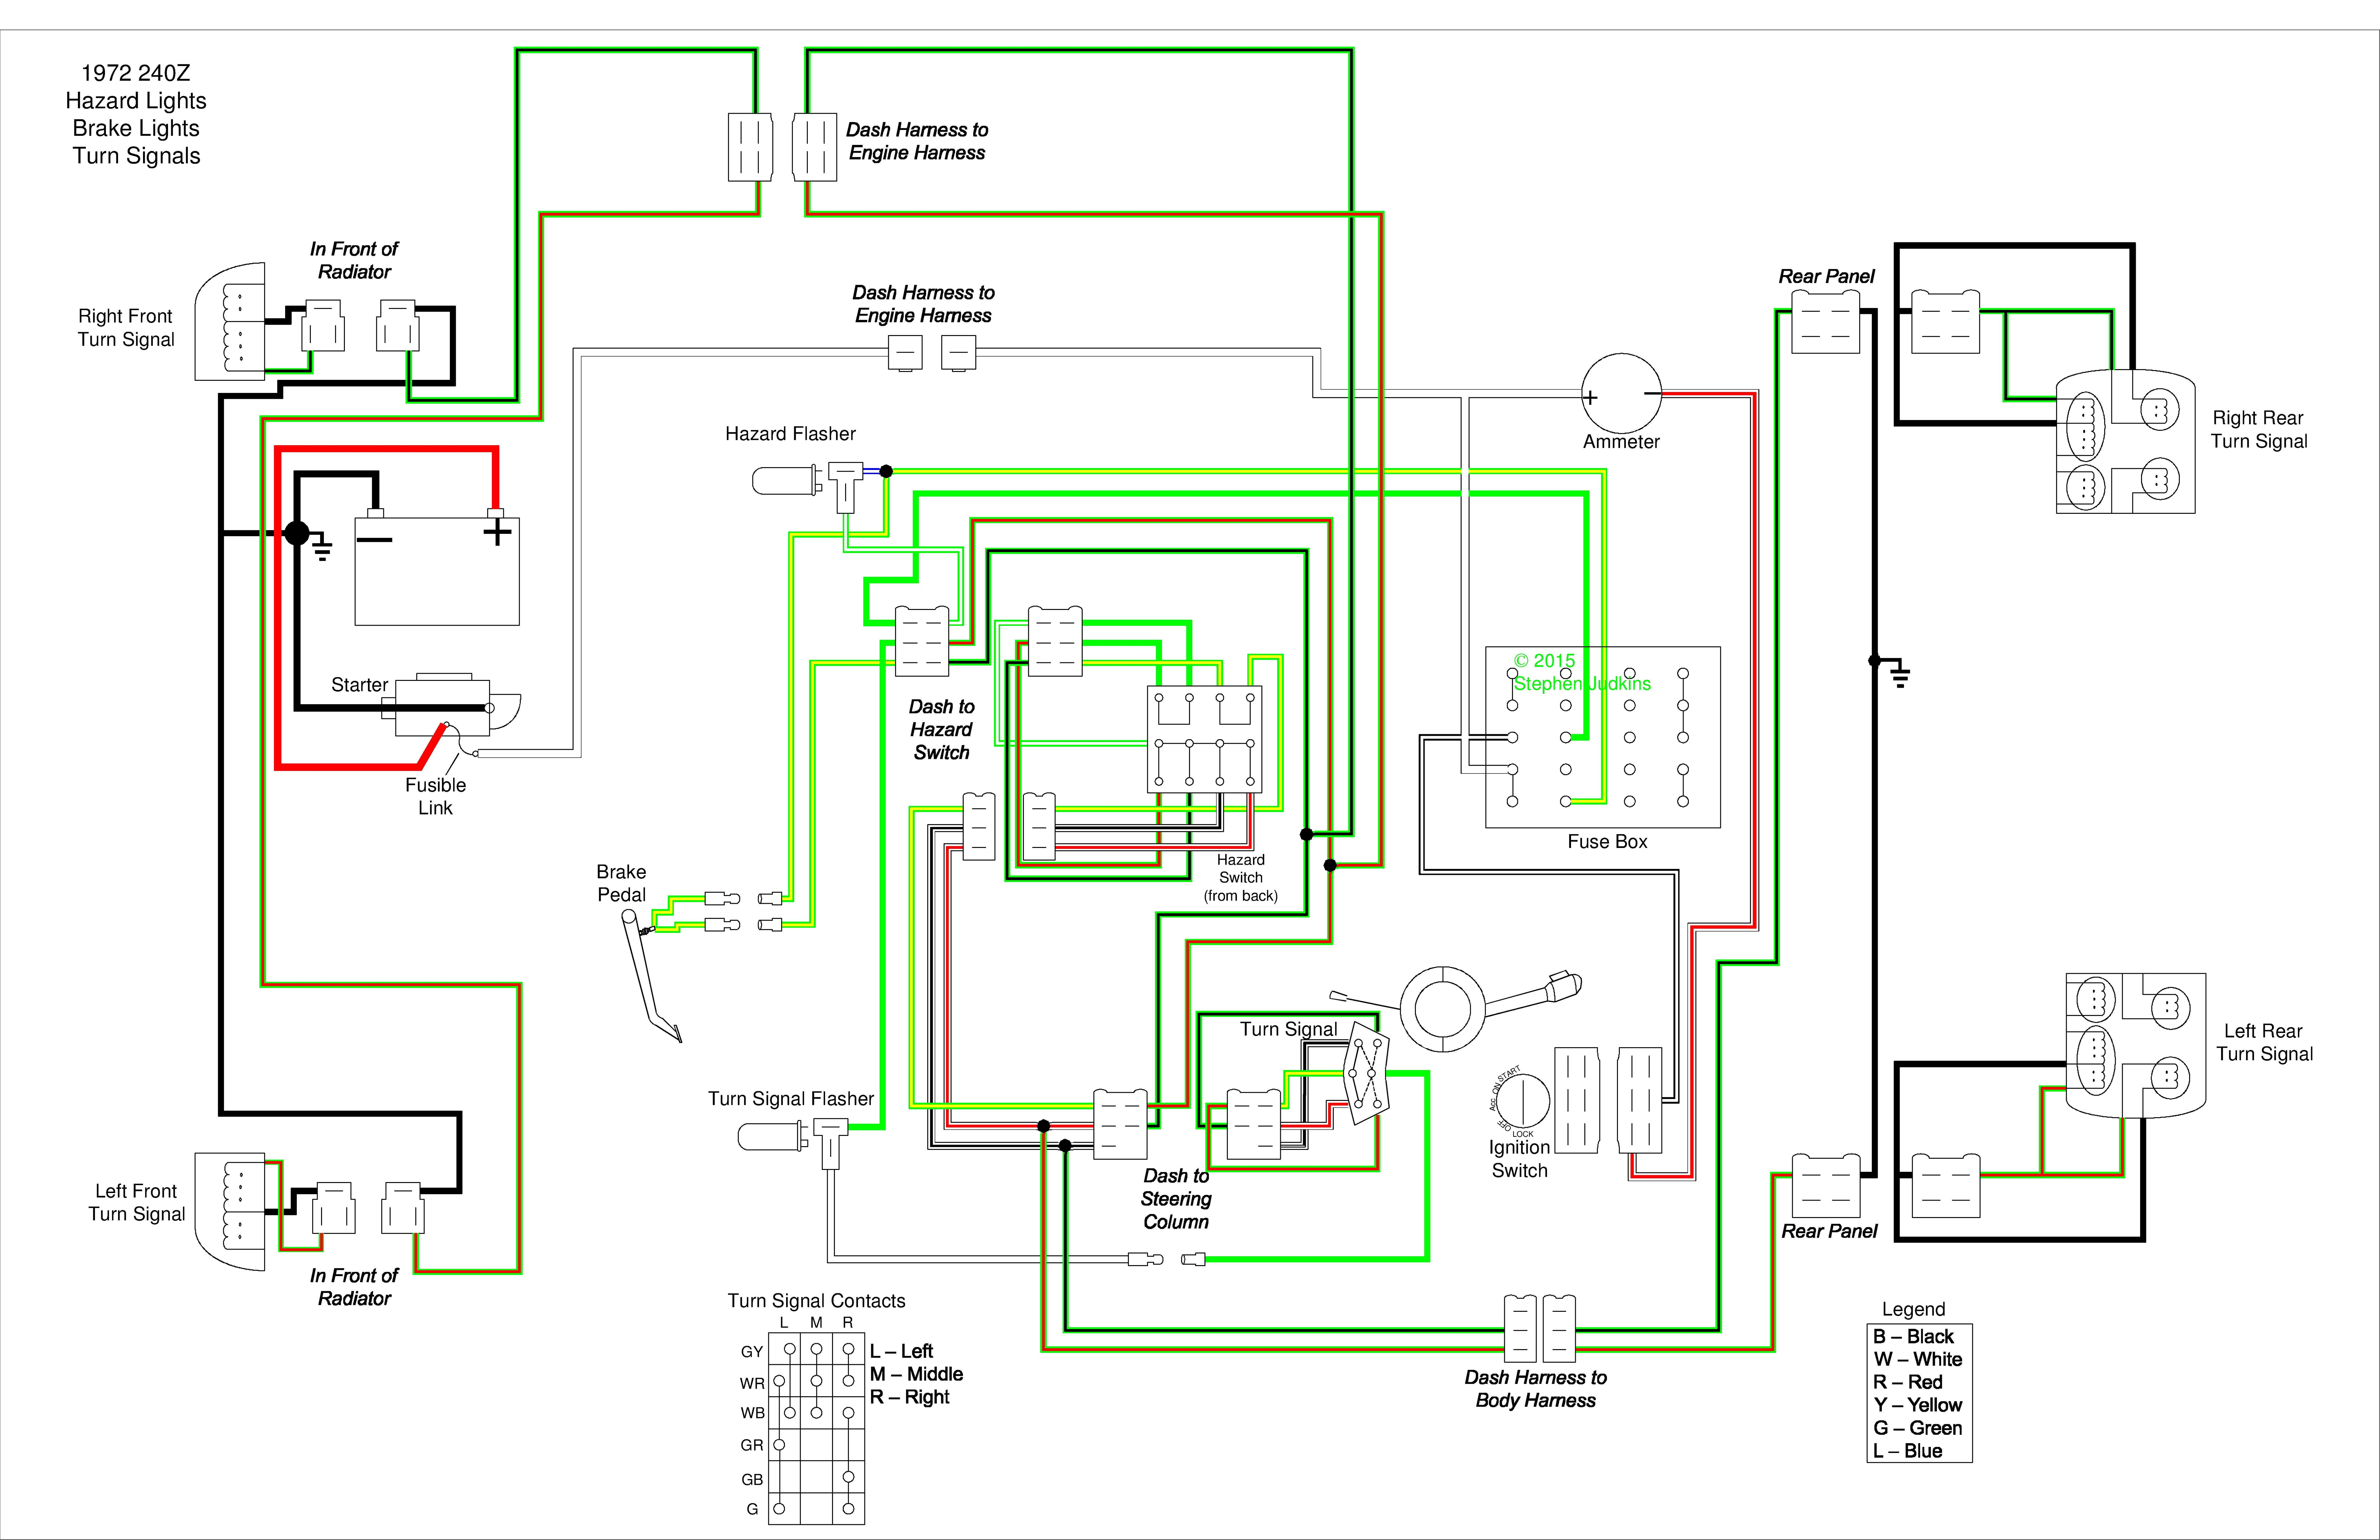 1971 datsun 510 wiring diagram nissan pulsar radio 240z motor